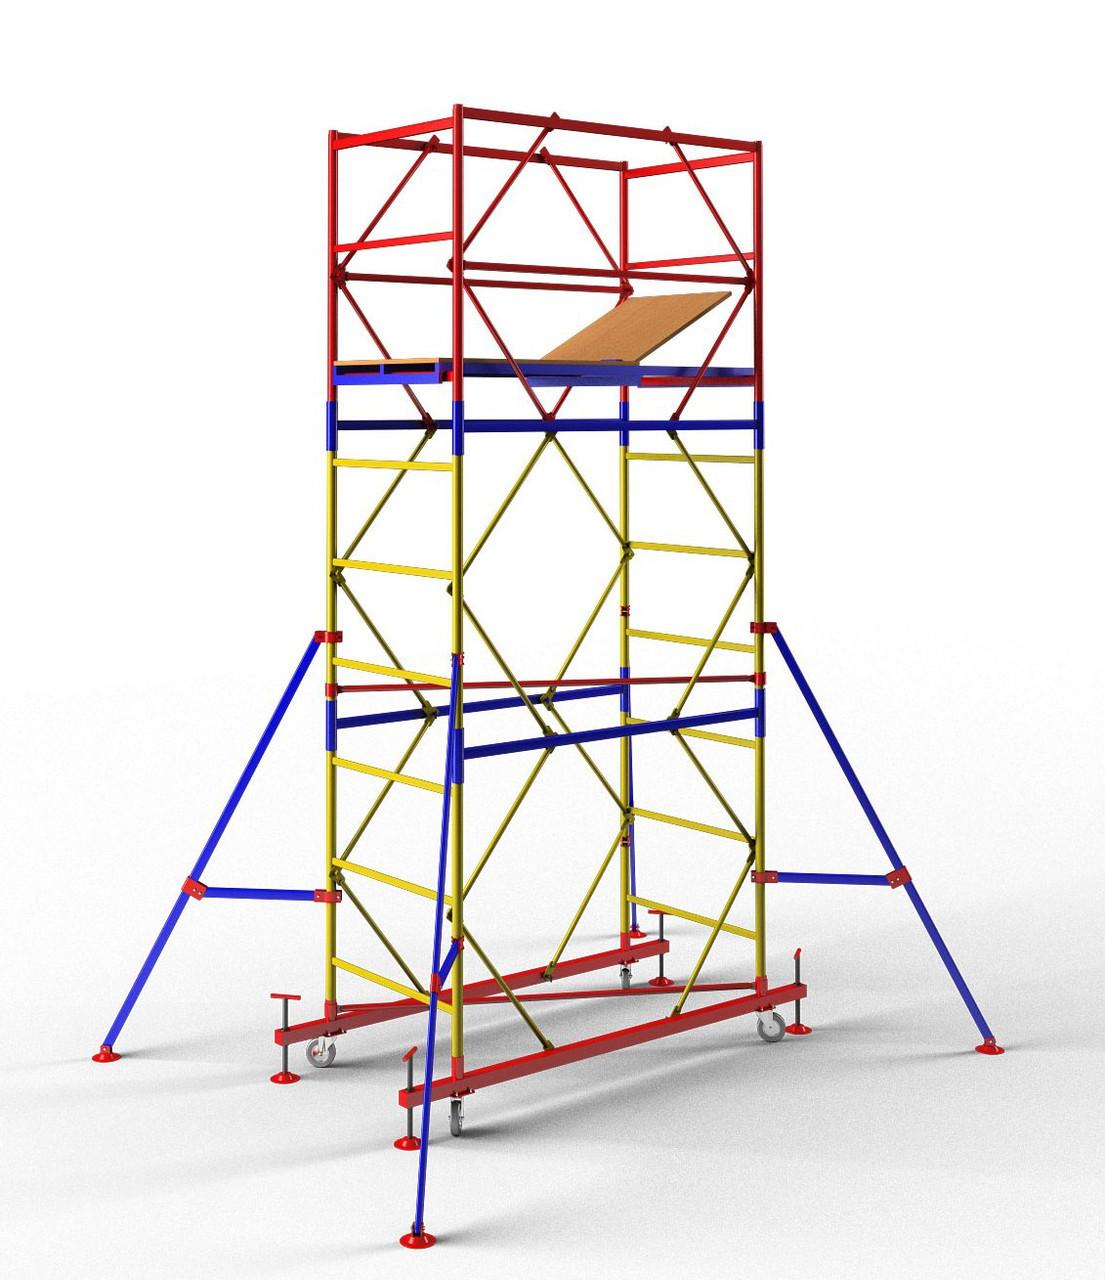 Вышка-тура мобильная облегченная 1,2 х 2,0 м (6+1) Раб.высота 9,8 м